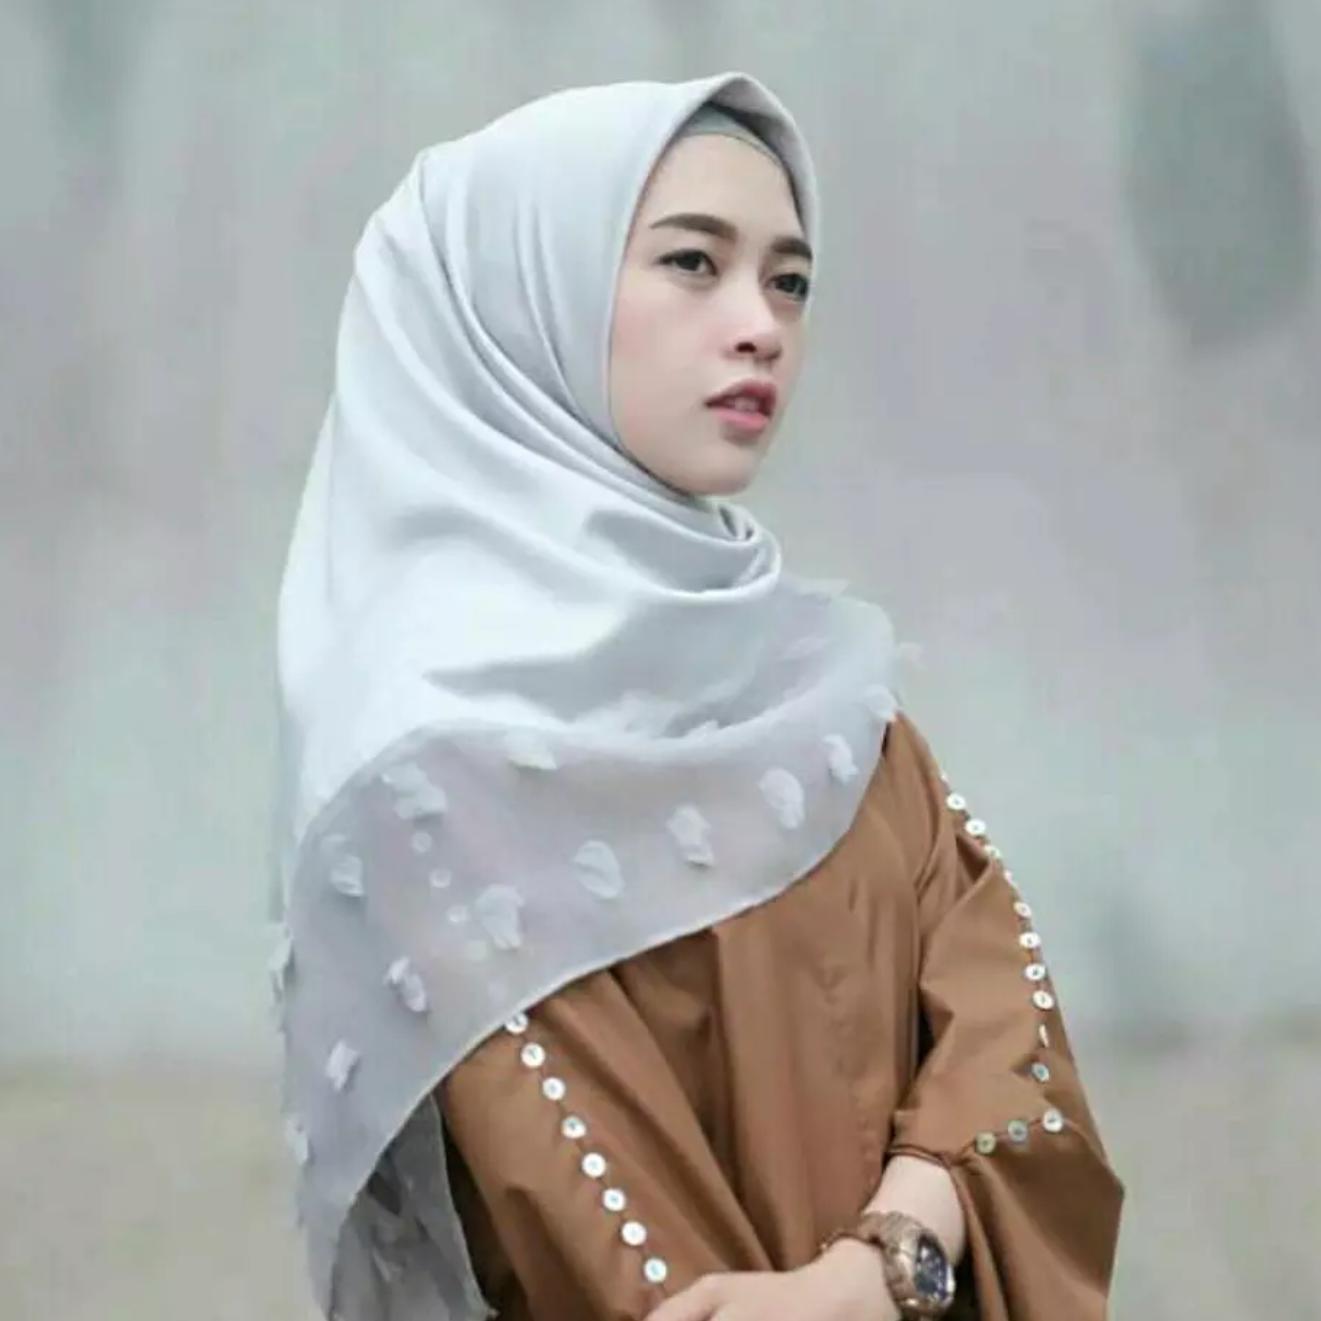 Penawaran Diskon Terbaik Jilbab Instant Siria Tammia Coksu Jualan Kerudung Instan Maula Hijab Square Segiempat Kombinasi Katun Dan Linen Ruby Rubiah